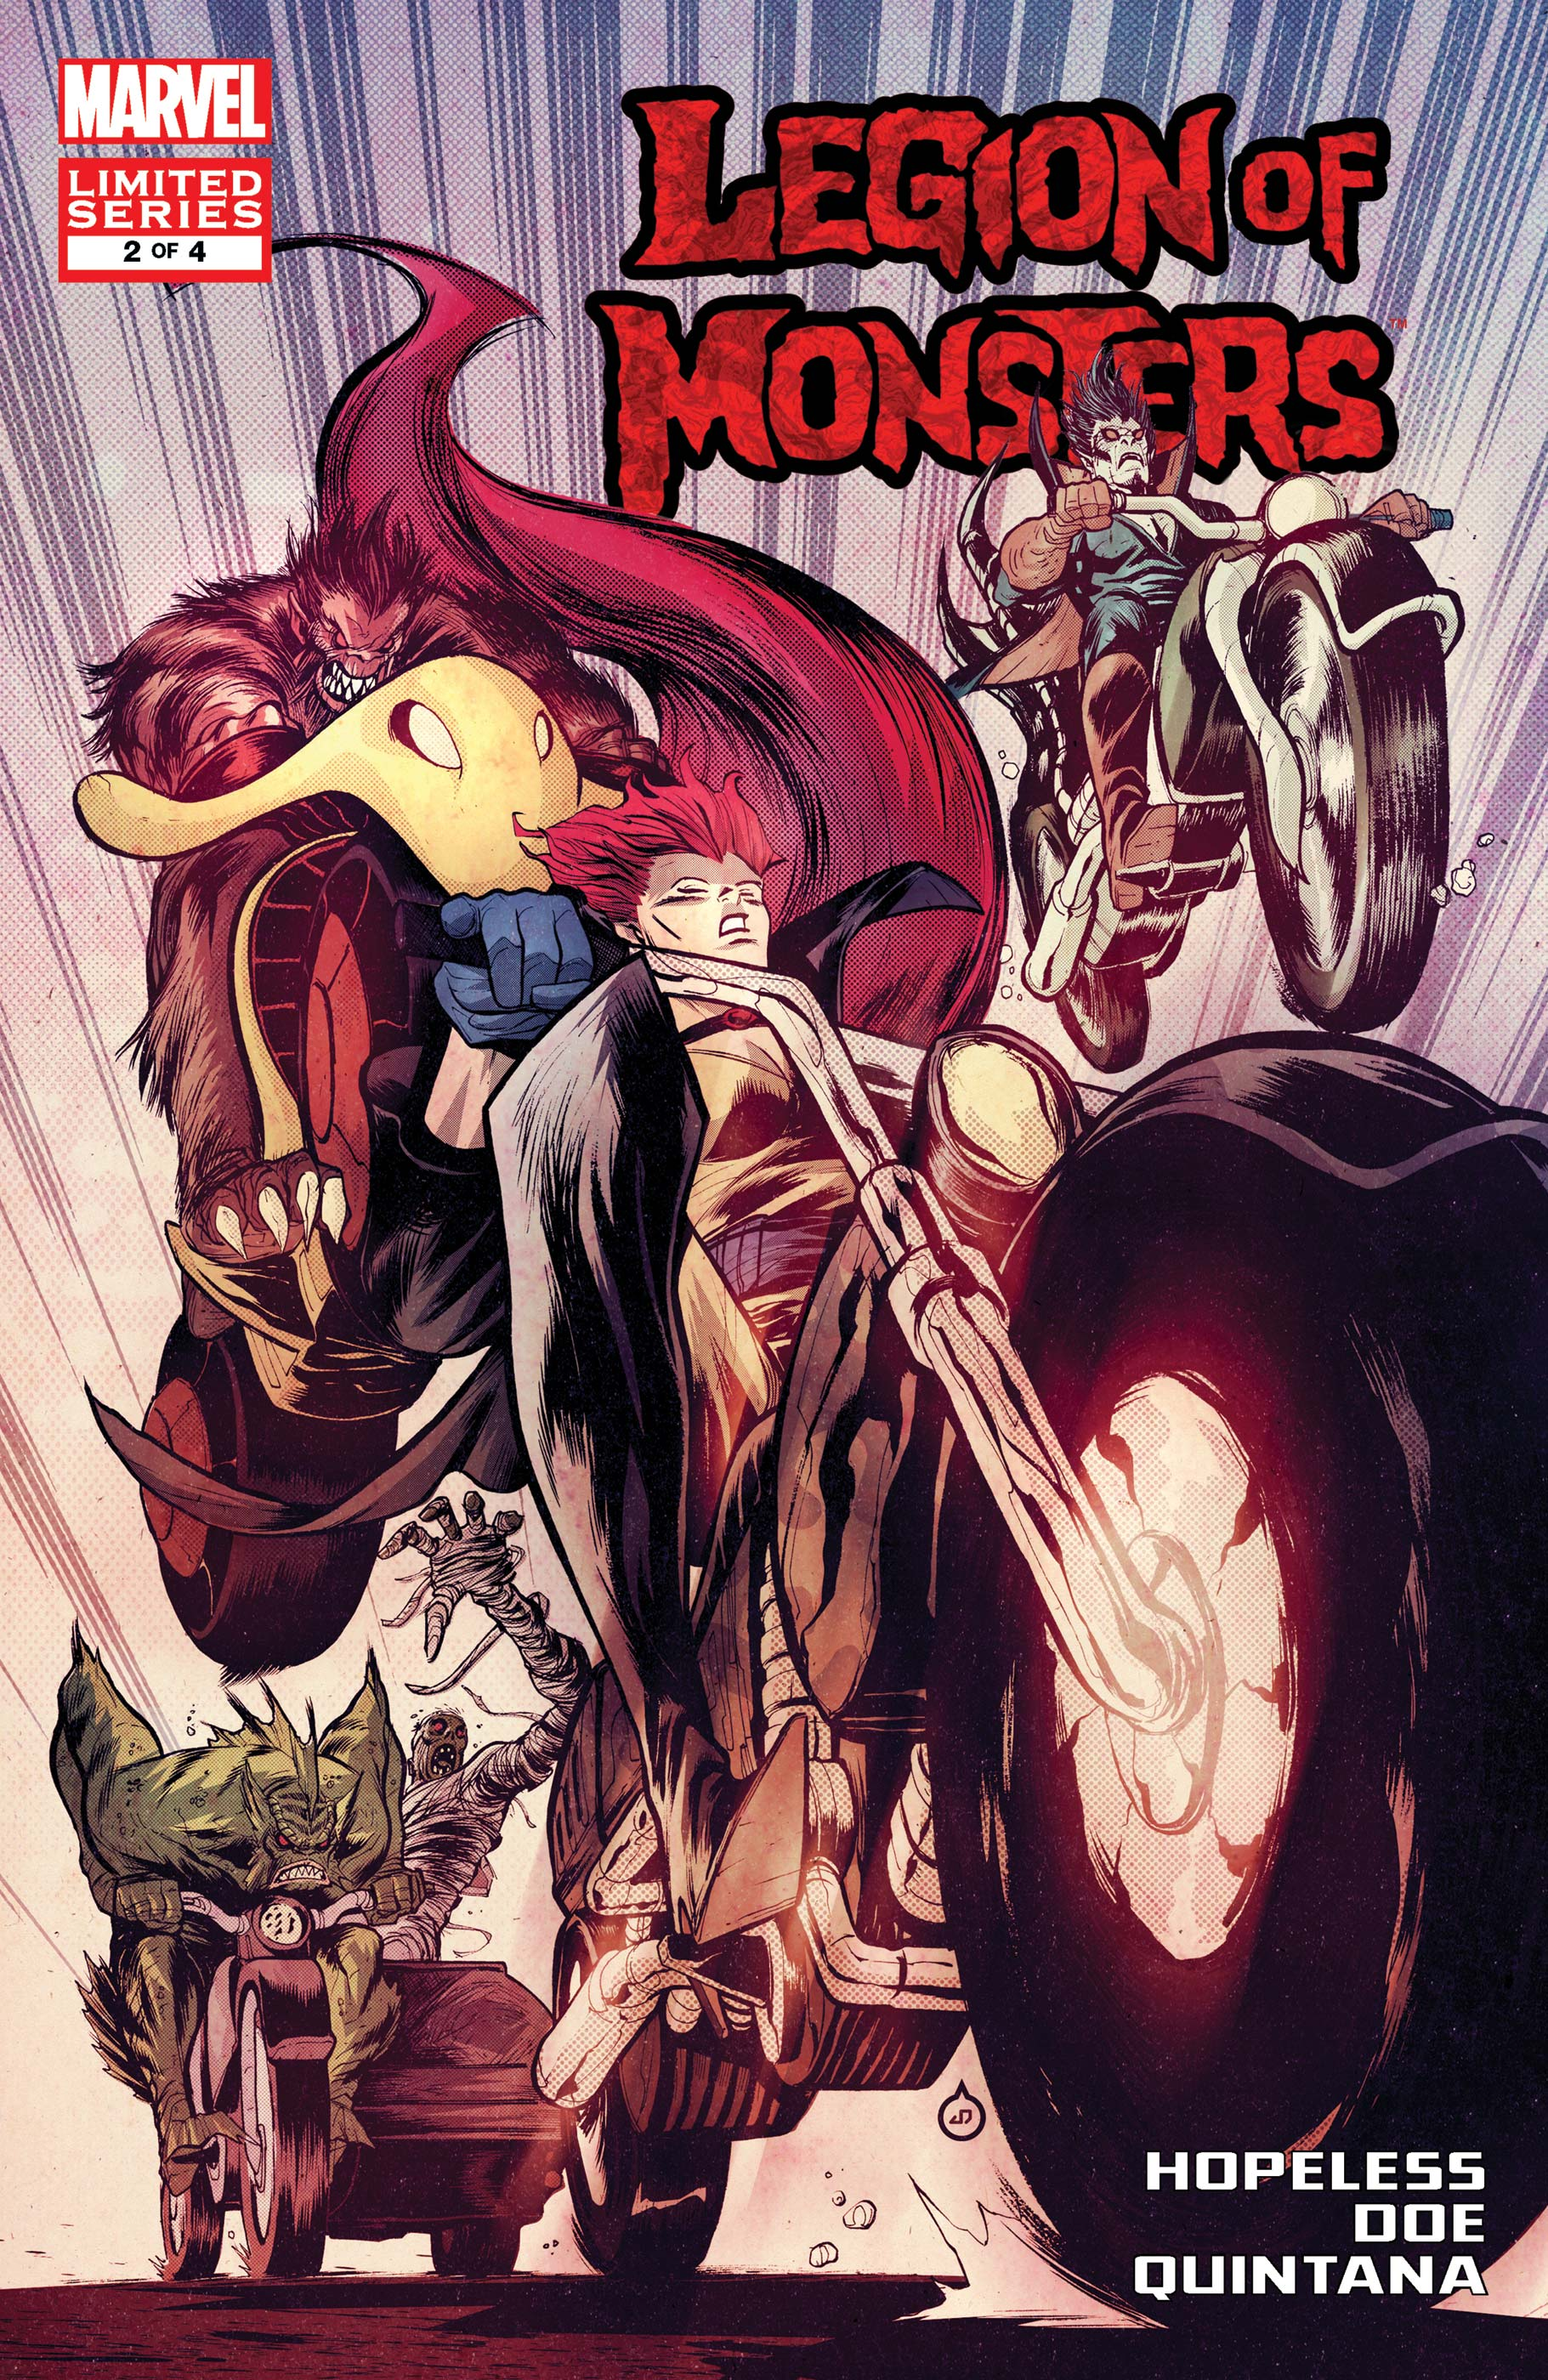 Legion of Monsters (2011) #2